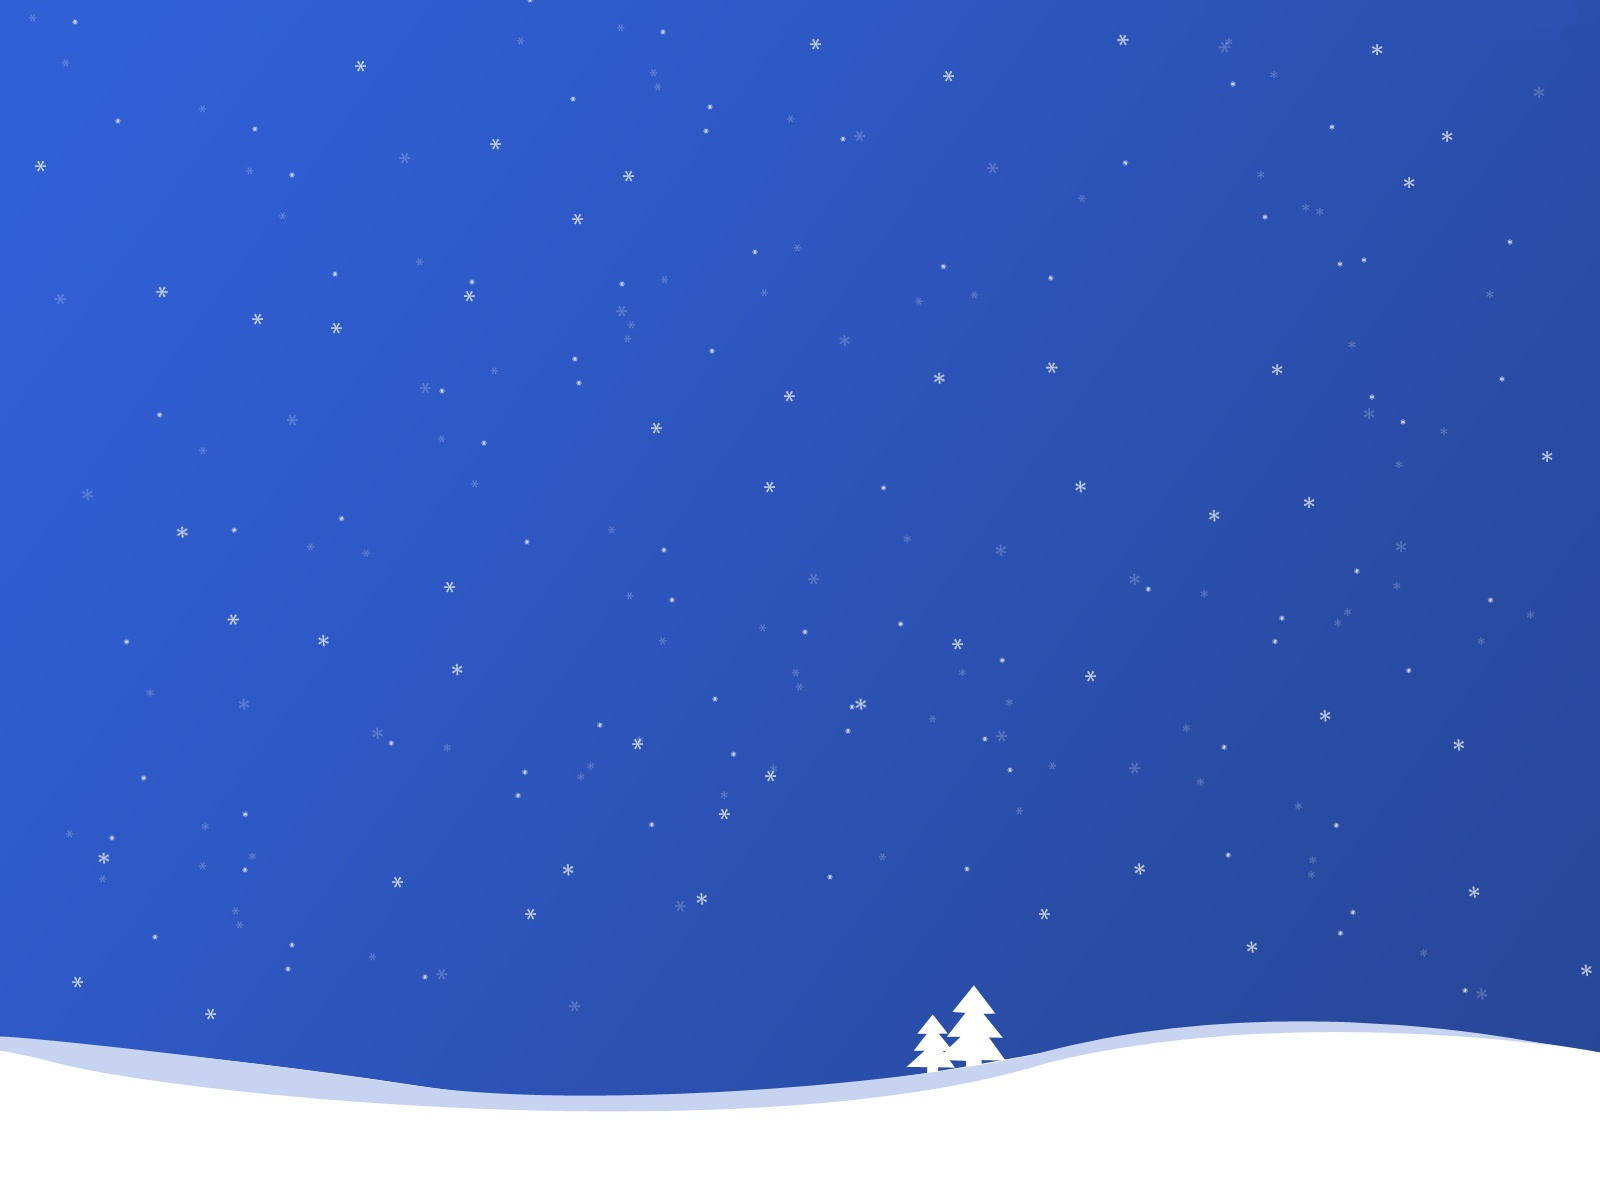 Blue Christmas Wallpaper HD  PixelsTalkNet